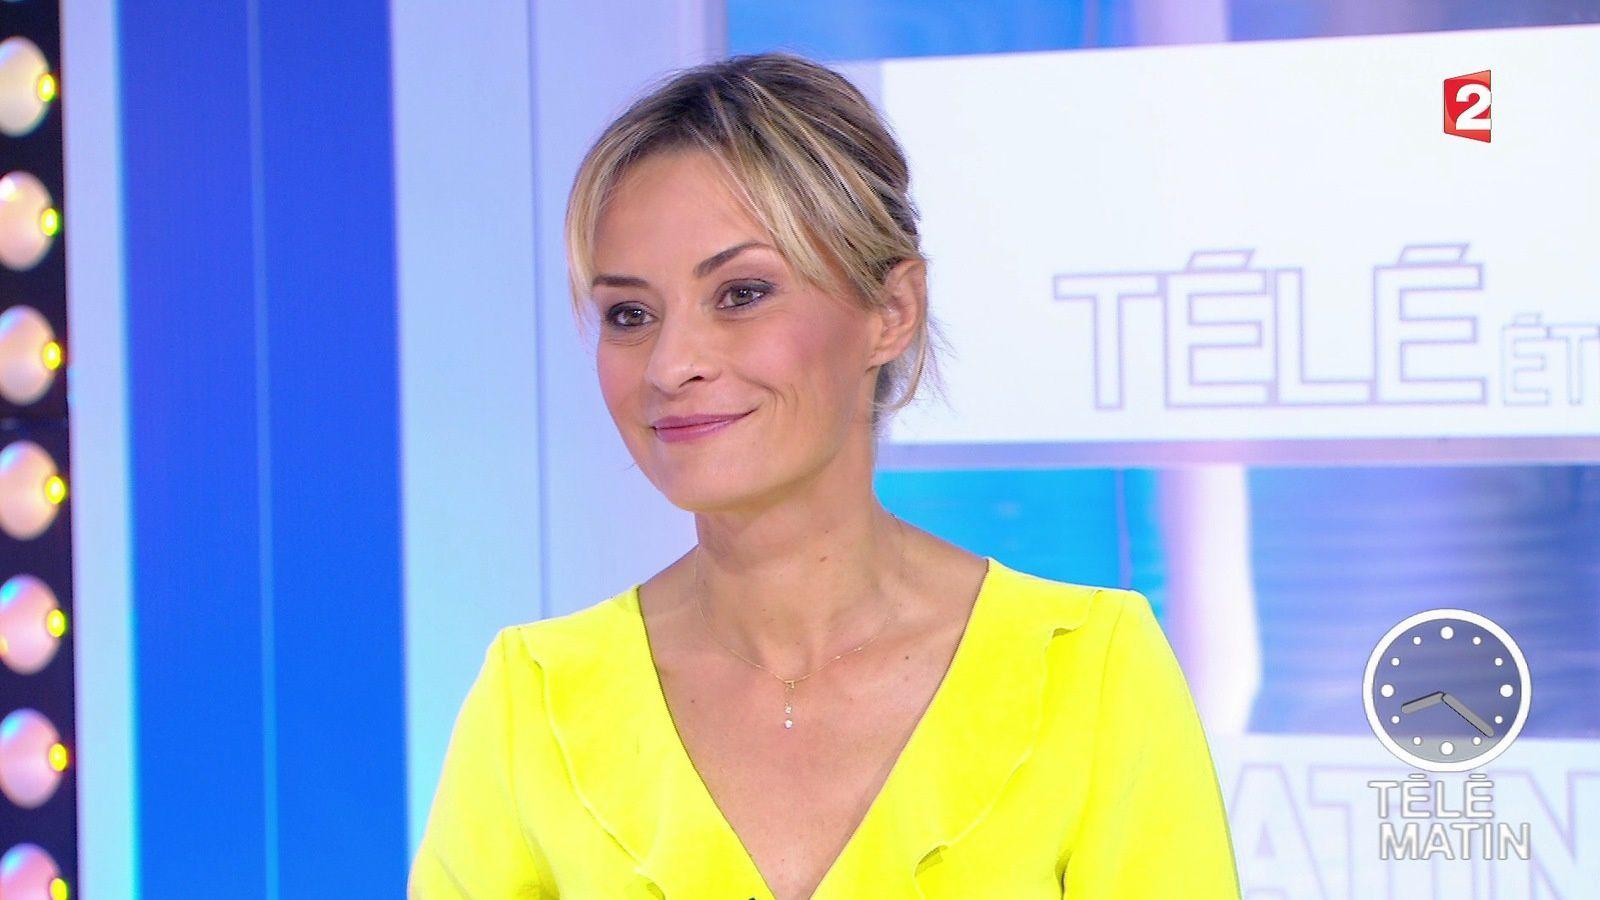 📸8 NATACHA HARRY @natacha_harry ce matin @telematin @France2tv #vuesalatele